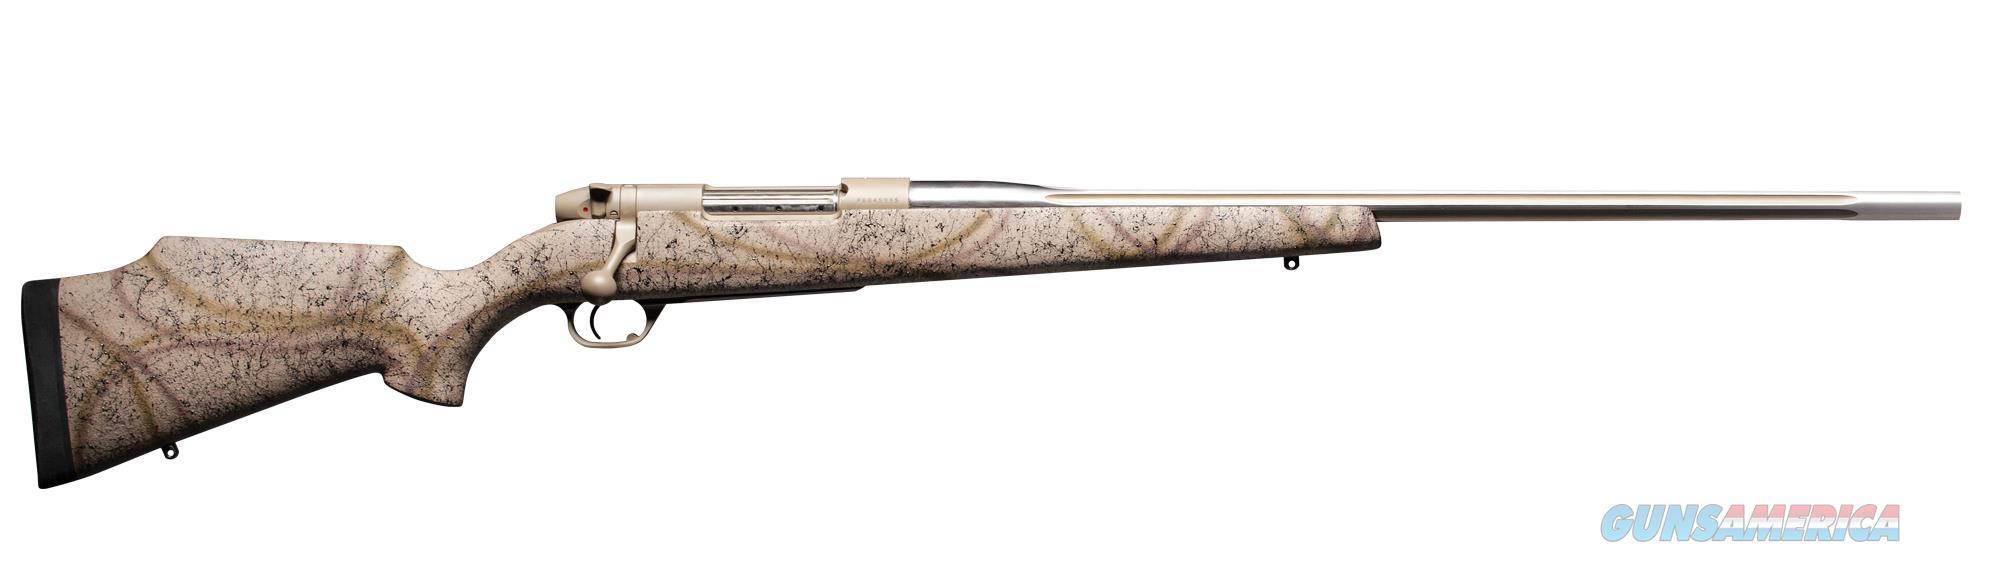 Weatherby Mark V Terramark 6.5 Creedmoor NEW MATS65CMR4O  Guns > Rifles > Weatherby Rifles > Sporting